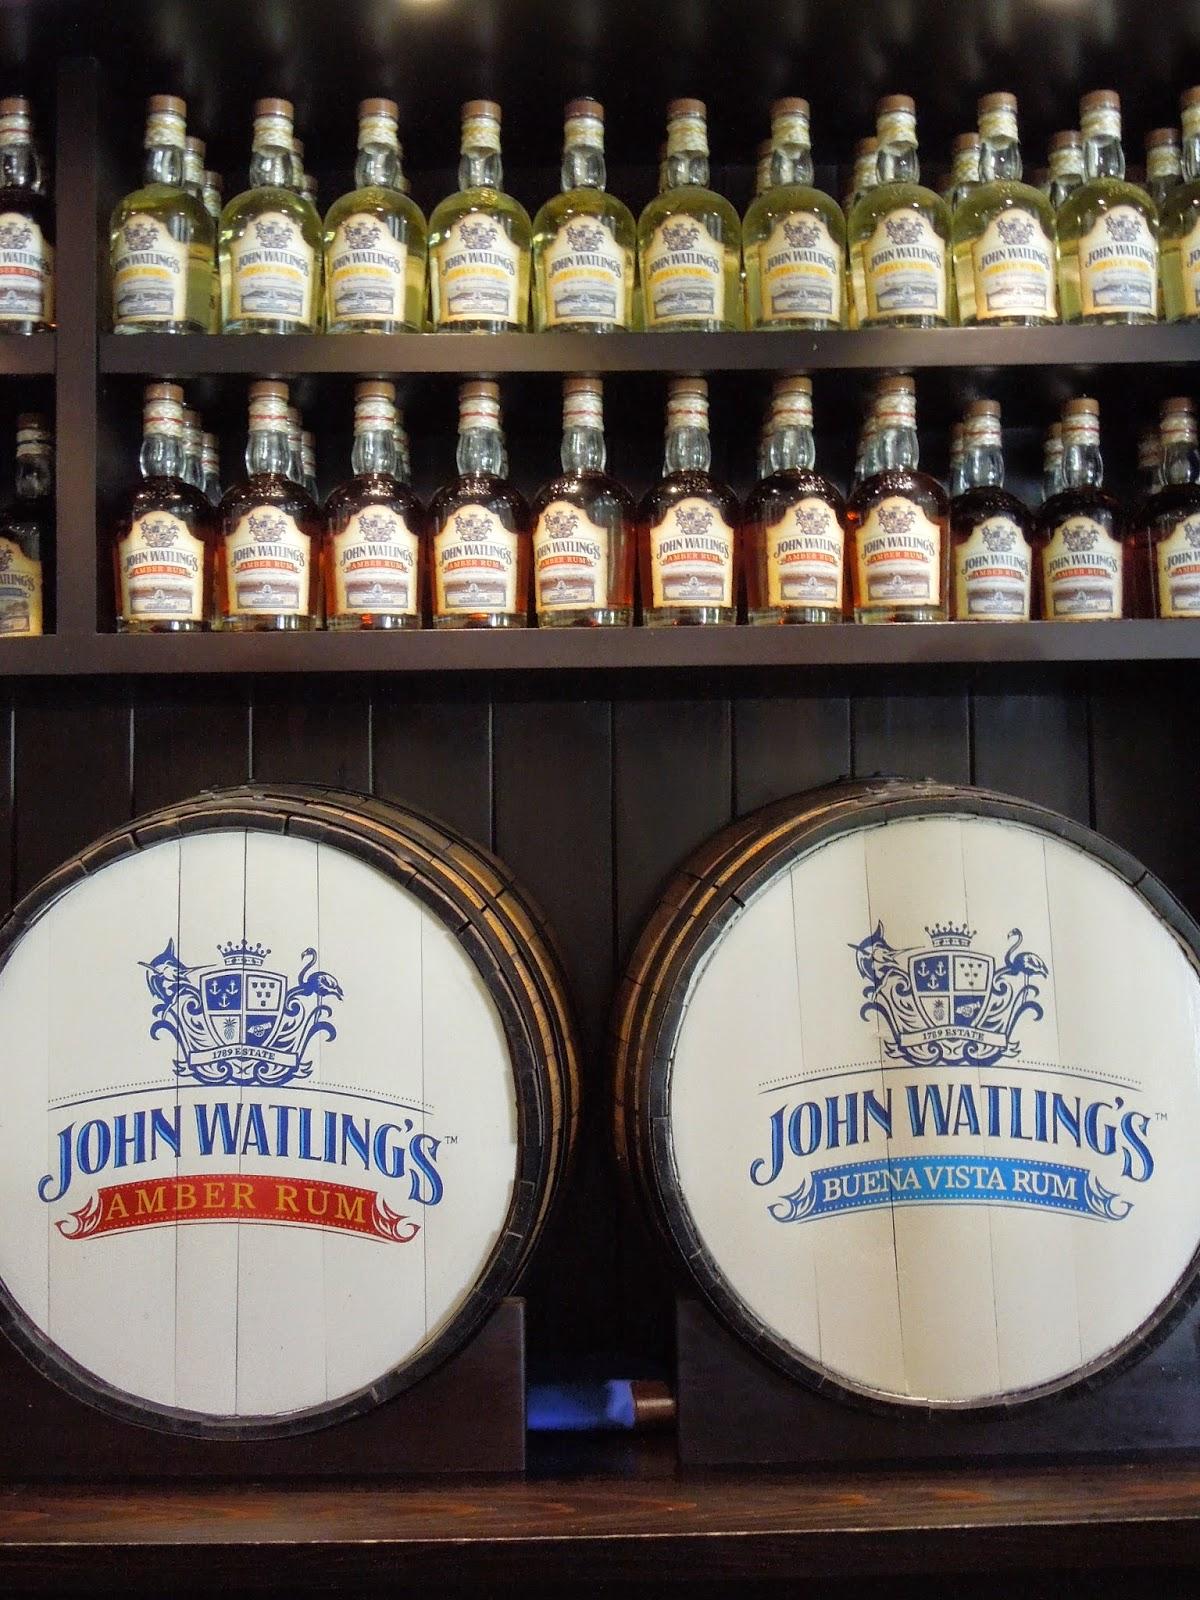 John Watling's rum